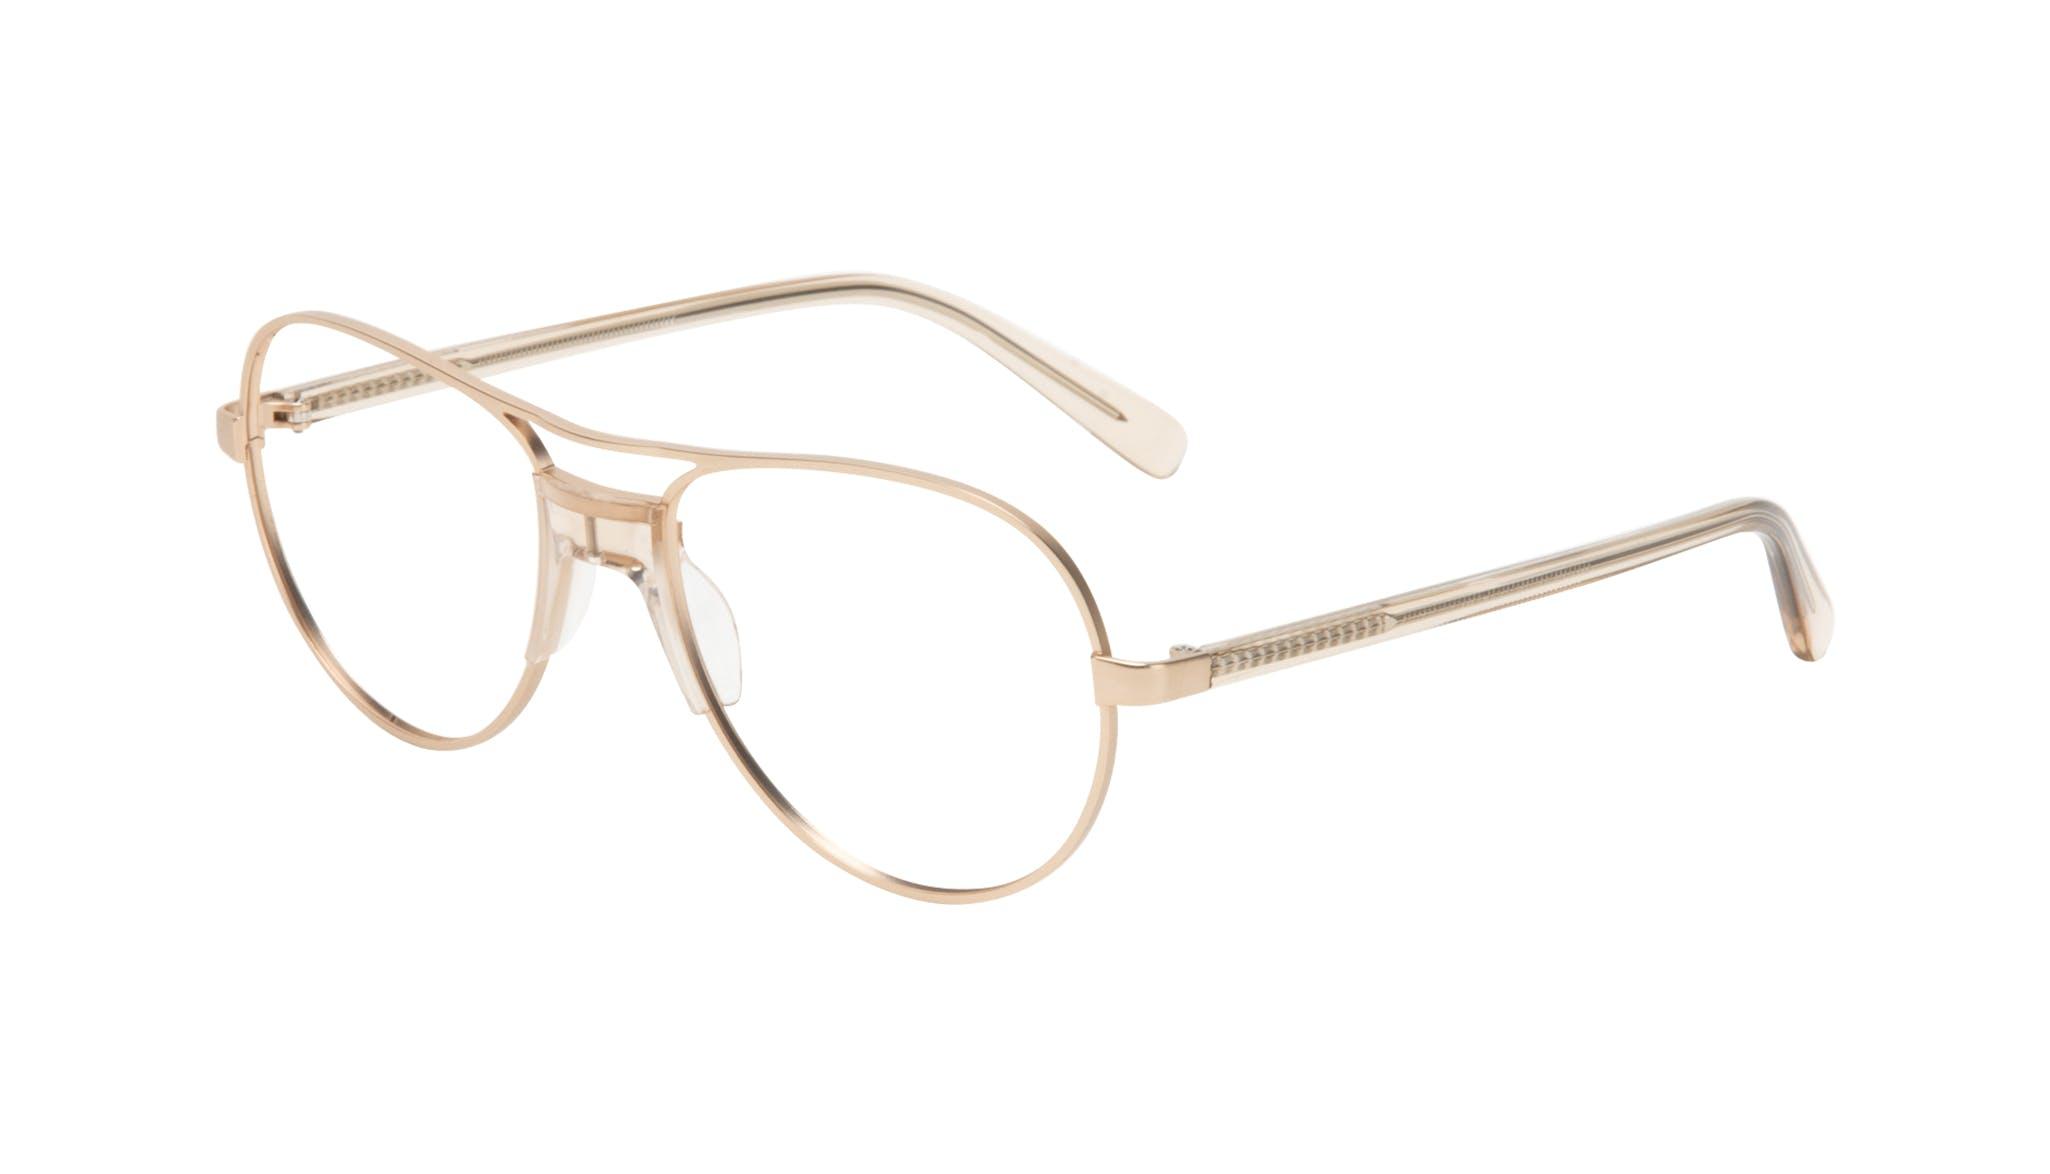 Affordable Fashion Glasses Aviator Eyeglasses Women Ultimate Gold Tilt